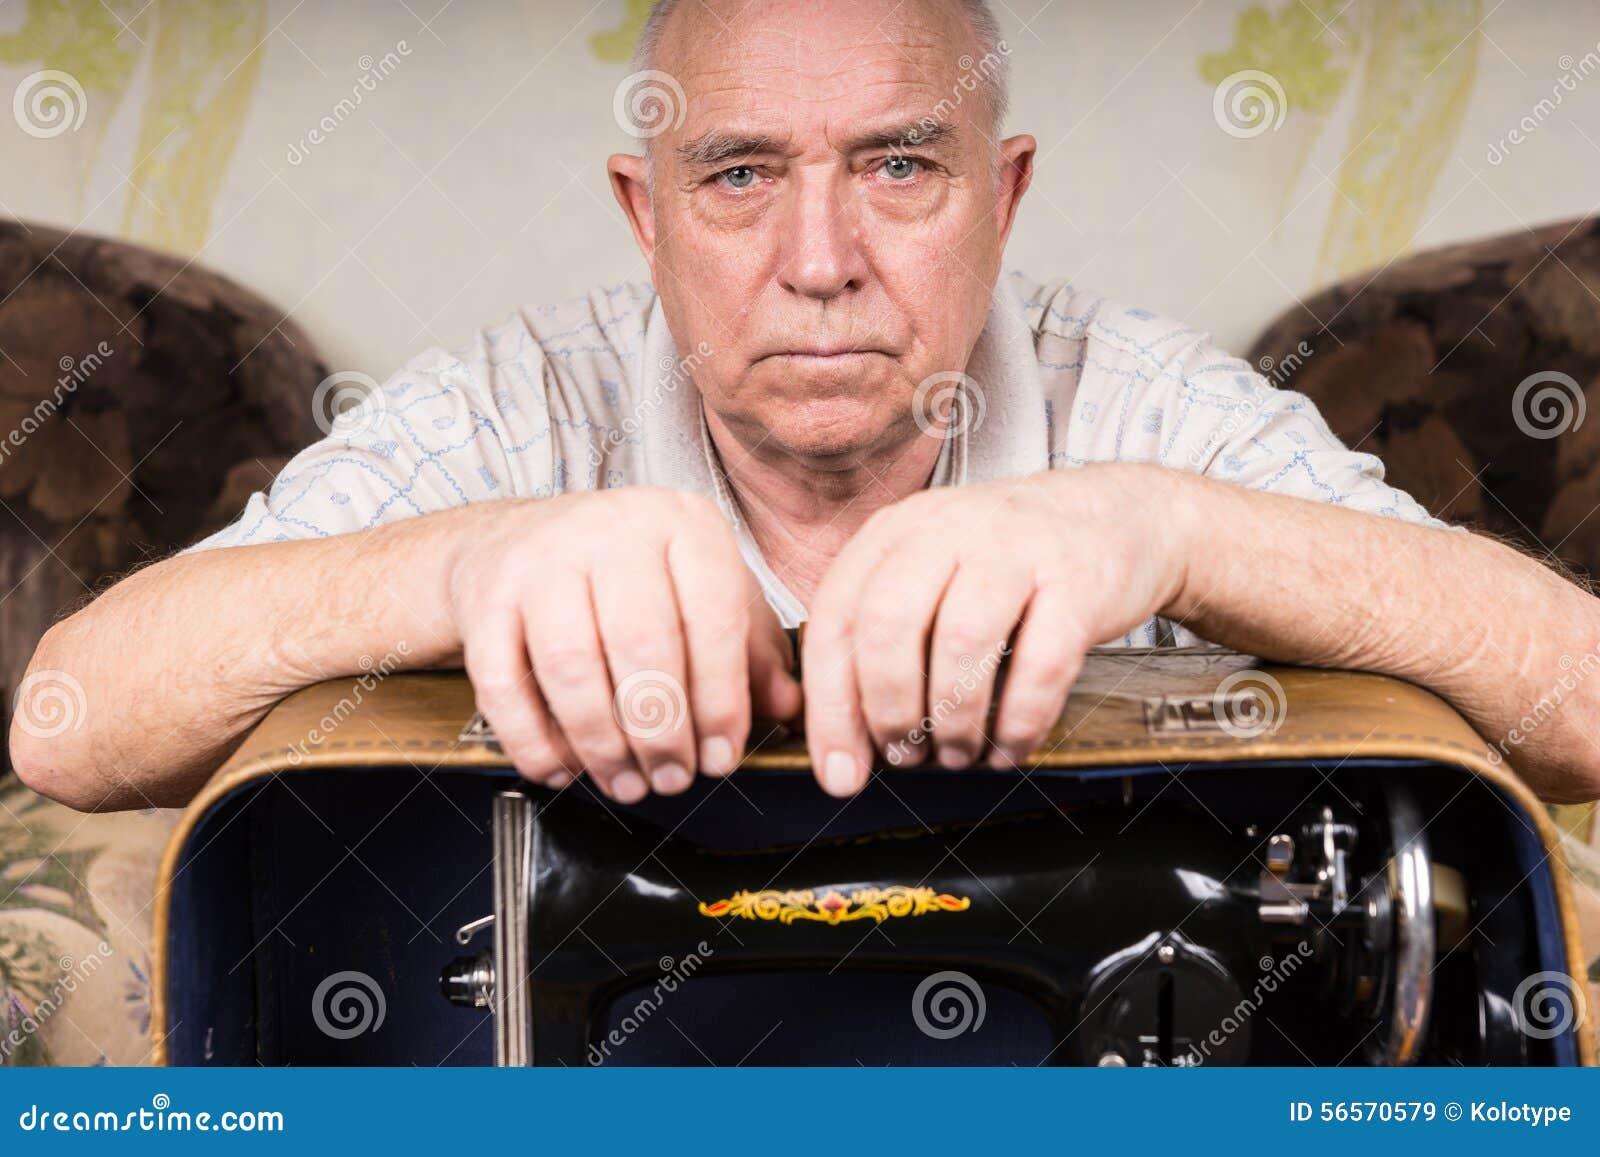 Download Σοβαρός παλαιός τύπος ραφτών που κλίνει στη ράβοντας μηχανή Στοκ Εικόνα - εικόνα από βελόνα, ηλικιωμένοι: 56570579